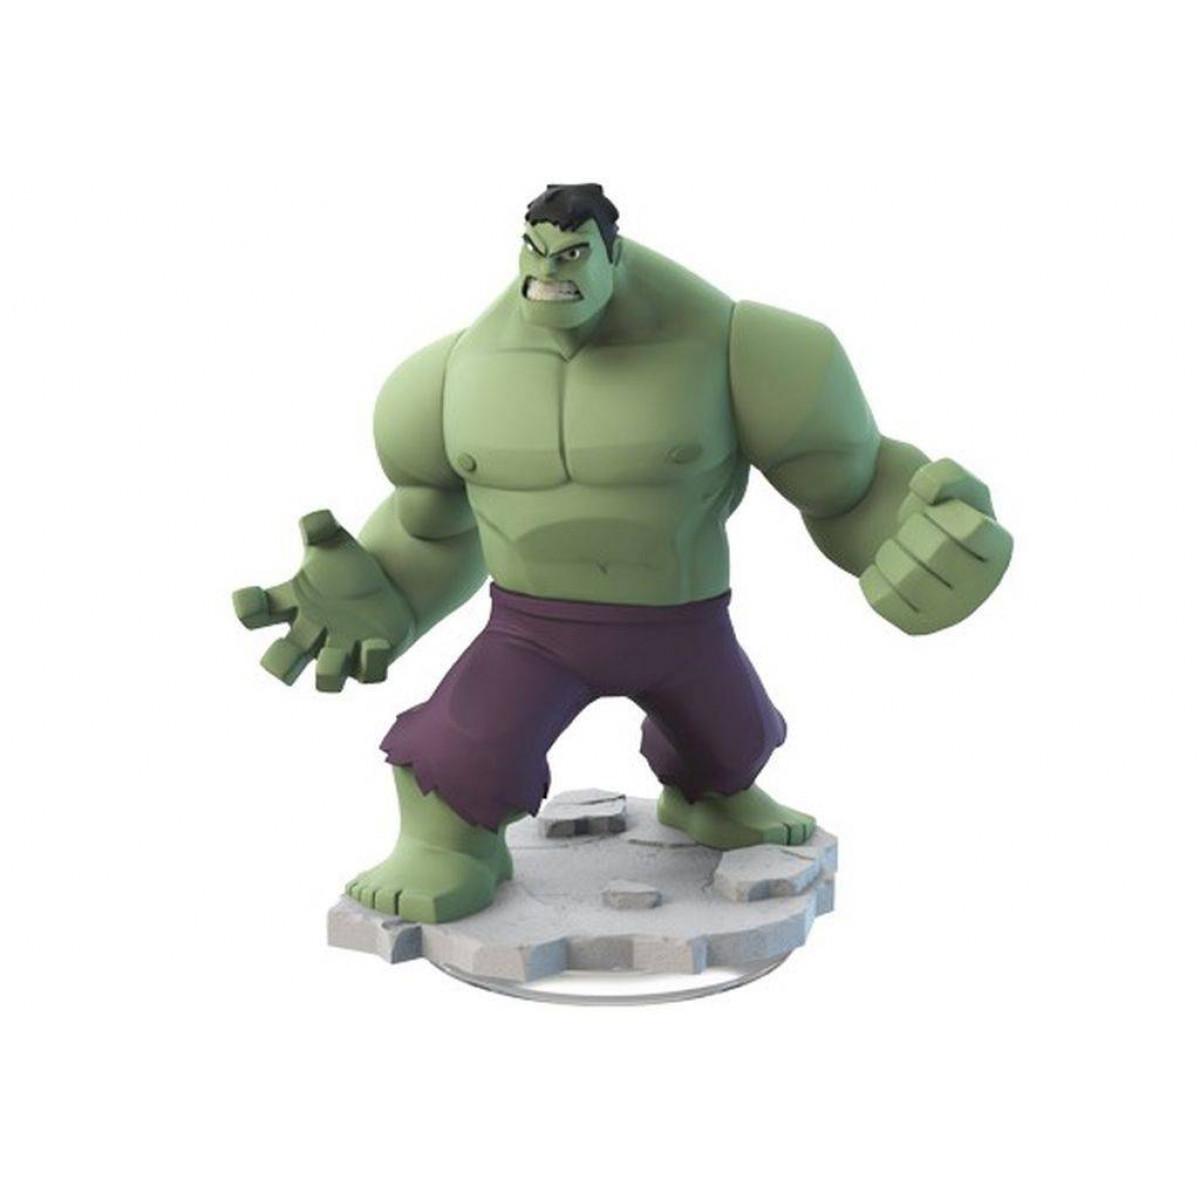 Disney Infinity 2.0 - Hulk játékfigura